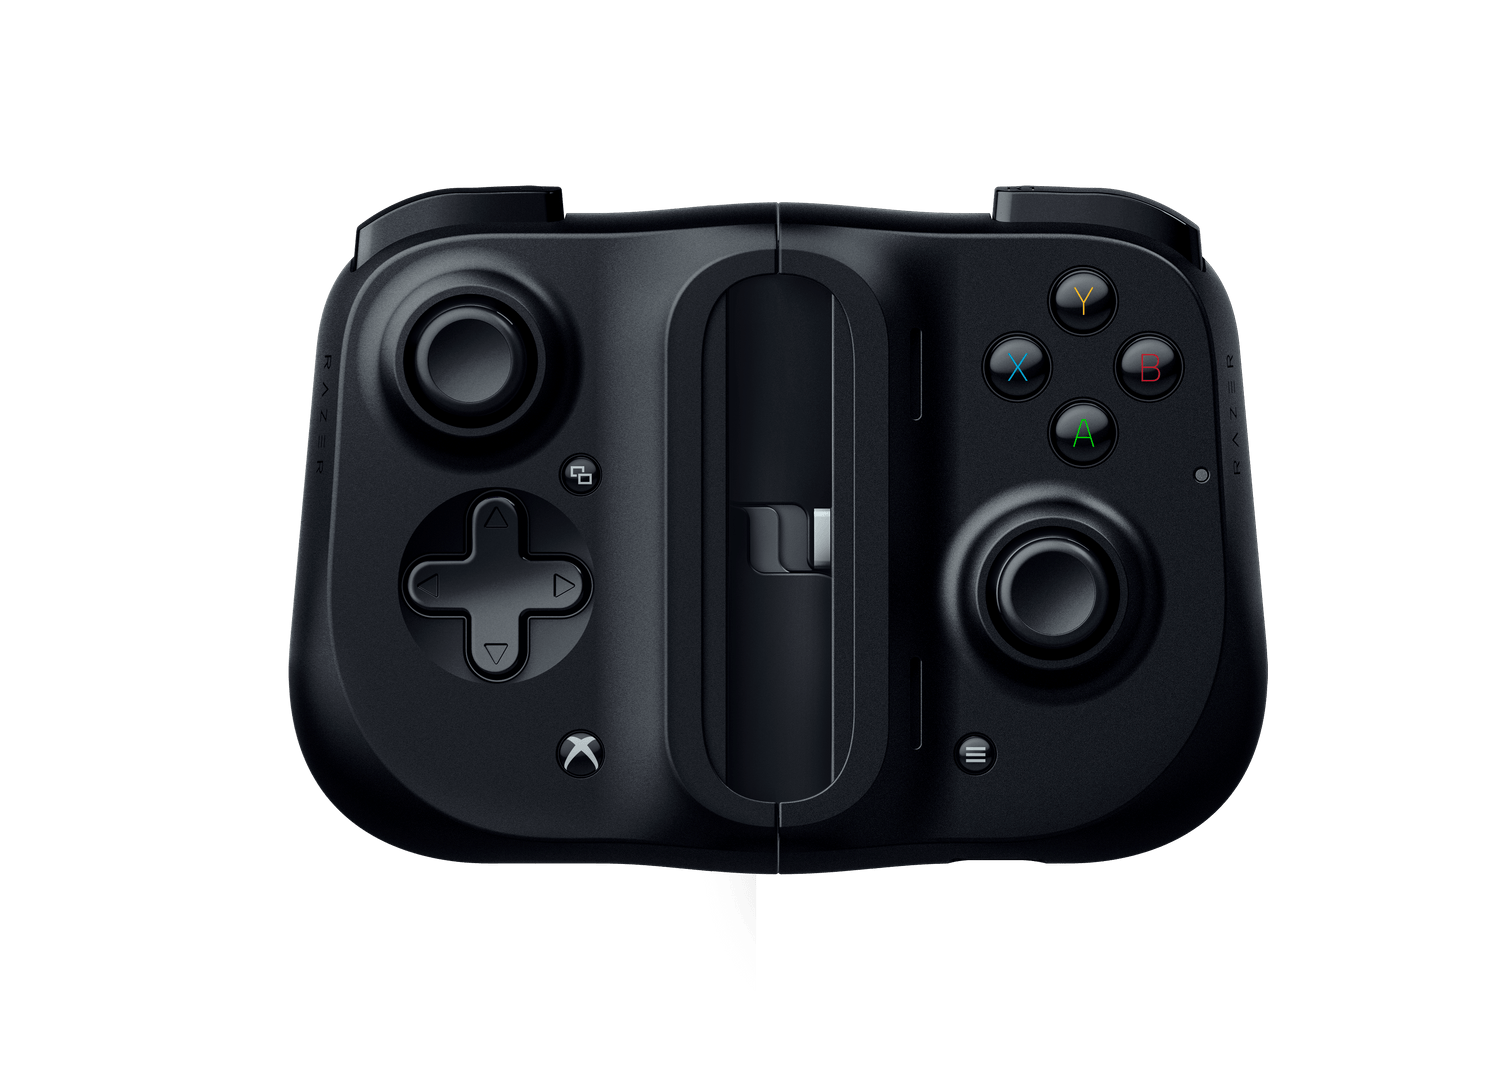 Razer KISHI (Xbox) Universal Mobile Gaming Controller for Android - Razer 1.20.80.02.007